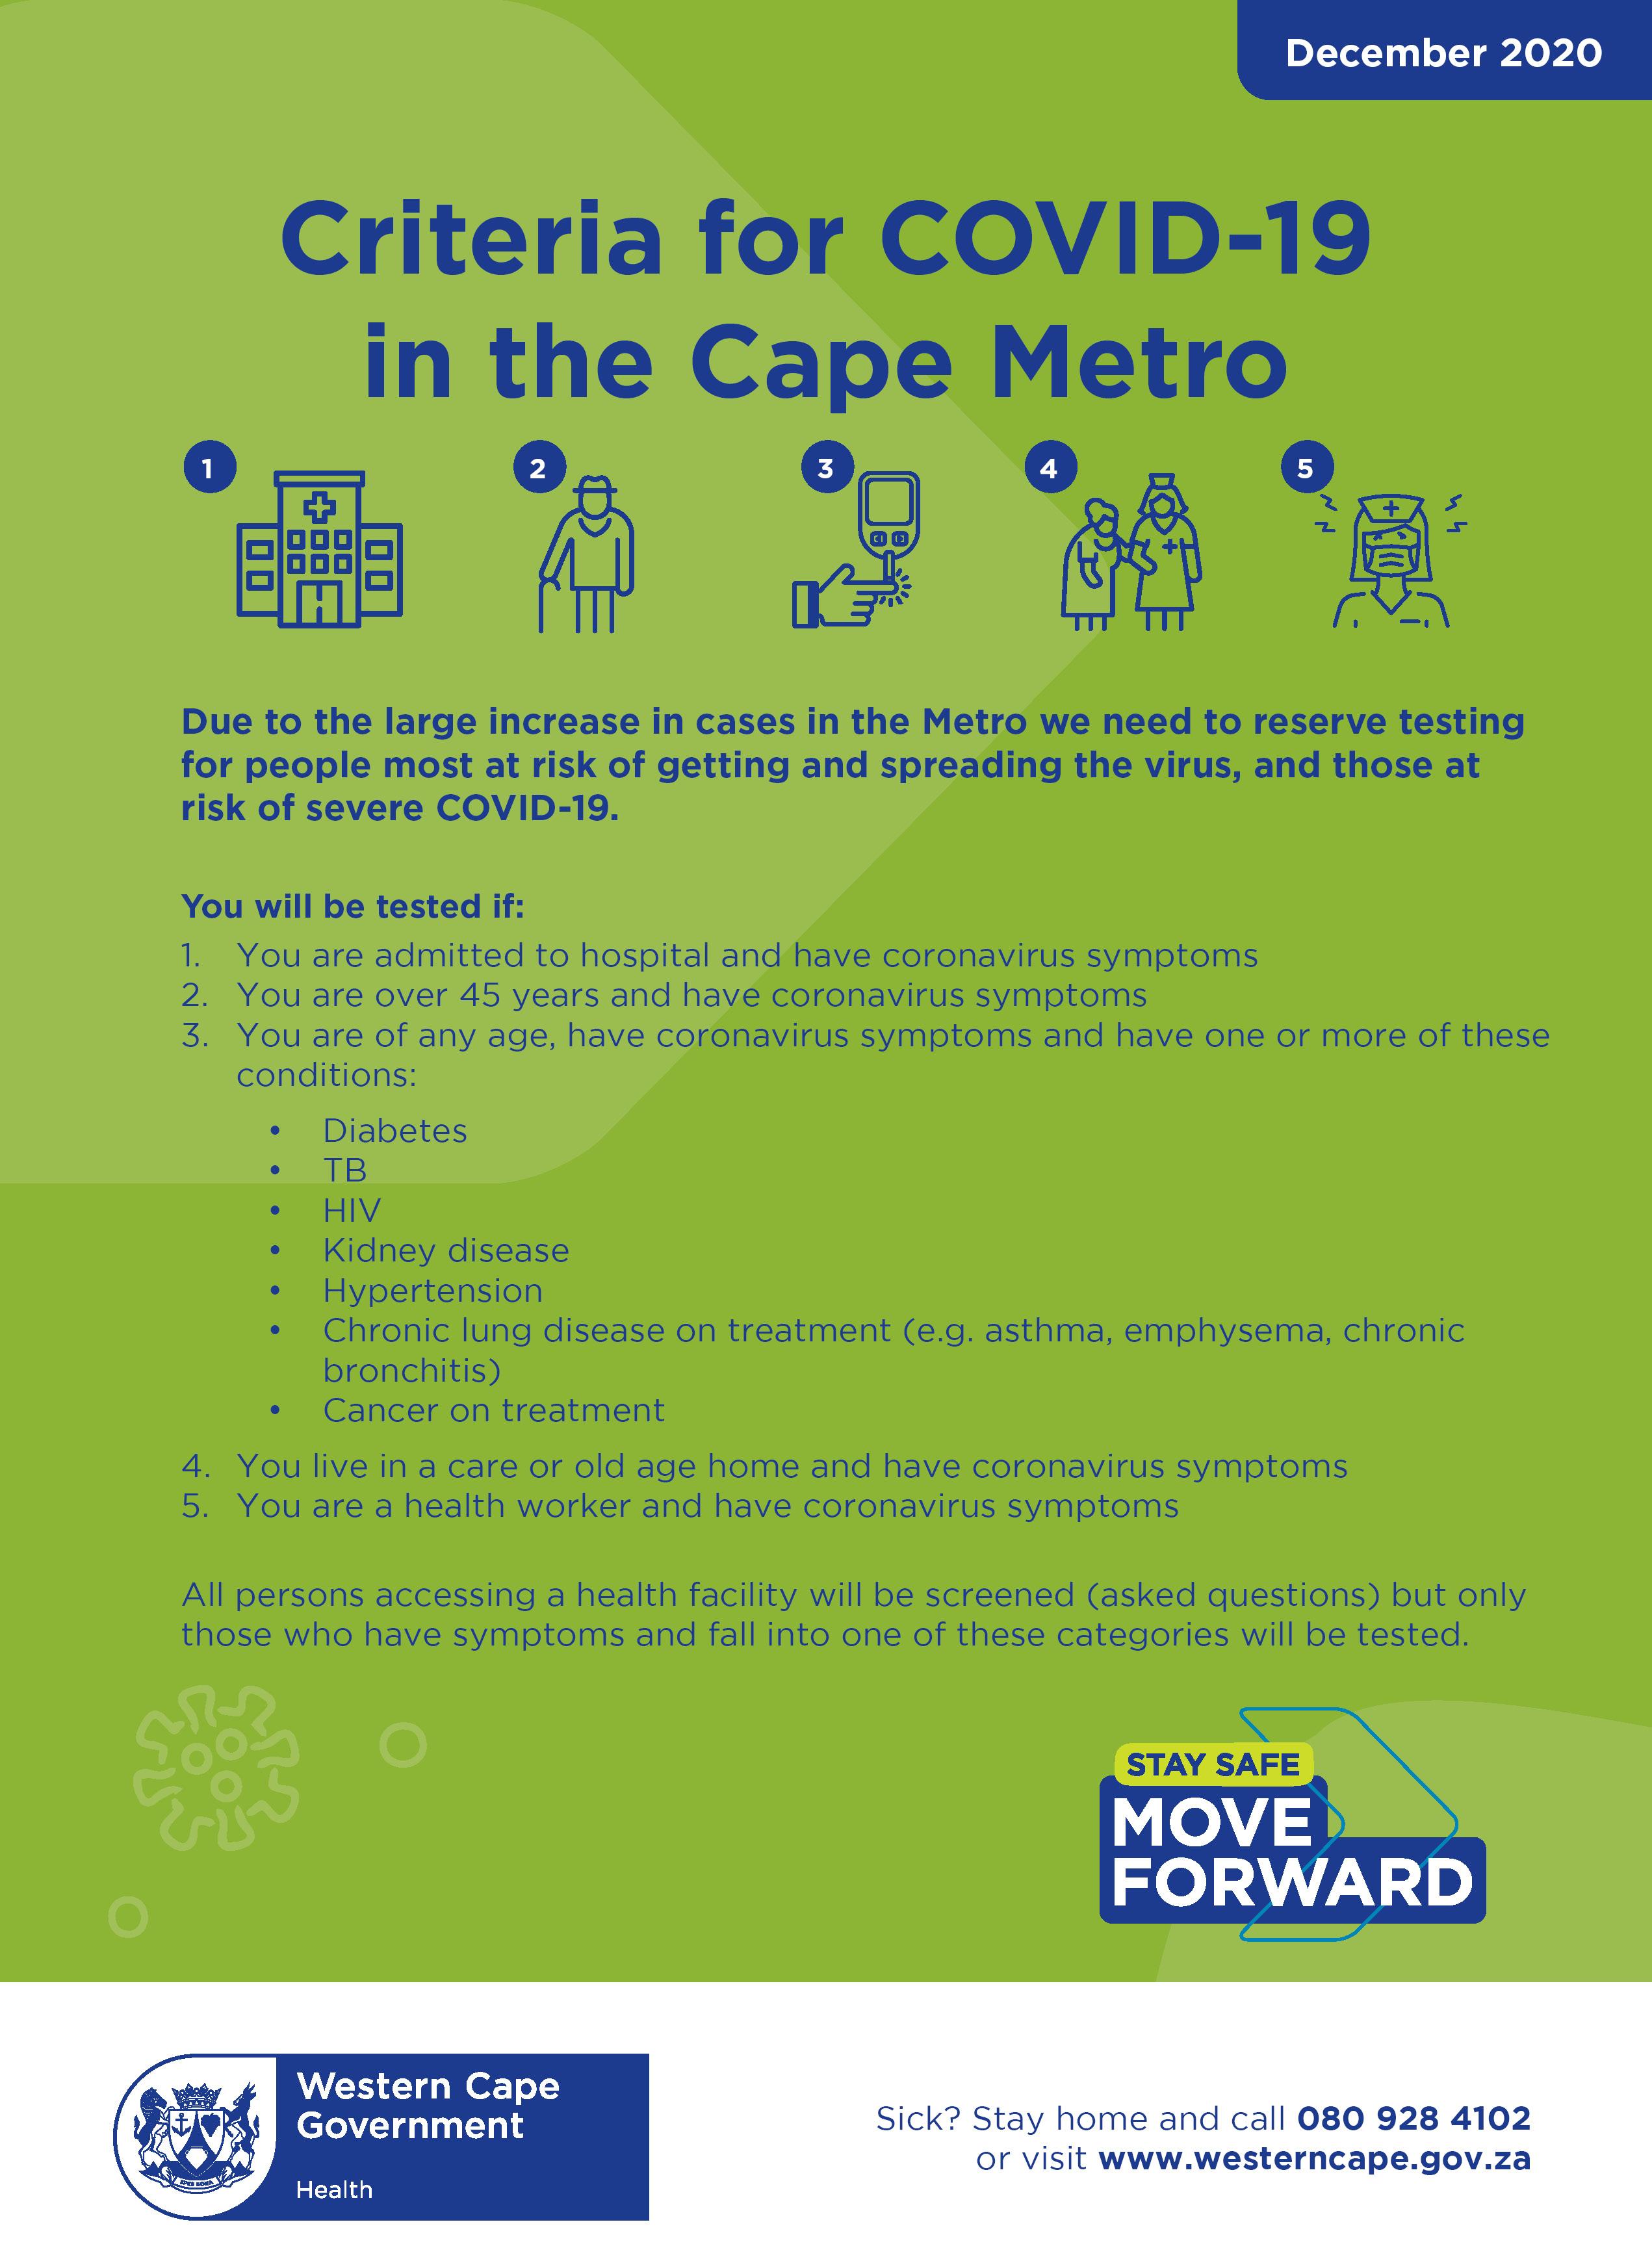 criteria_for_testing_in_the_cape_metro_-_english.jpg